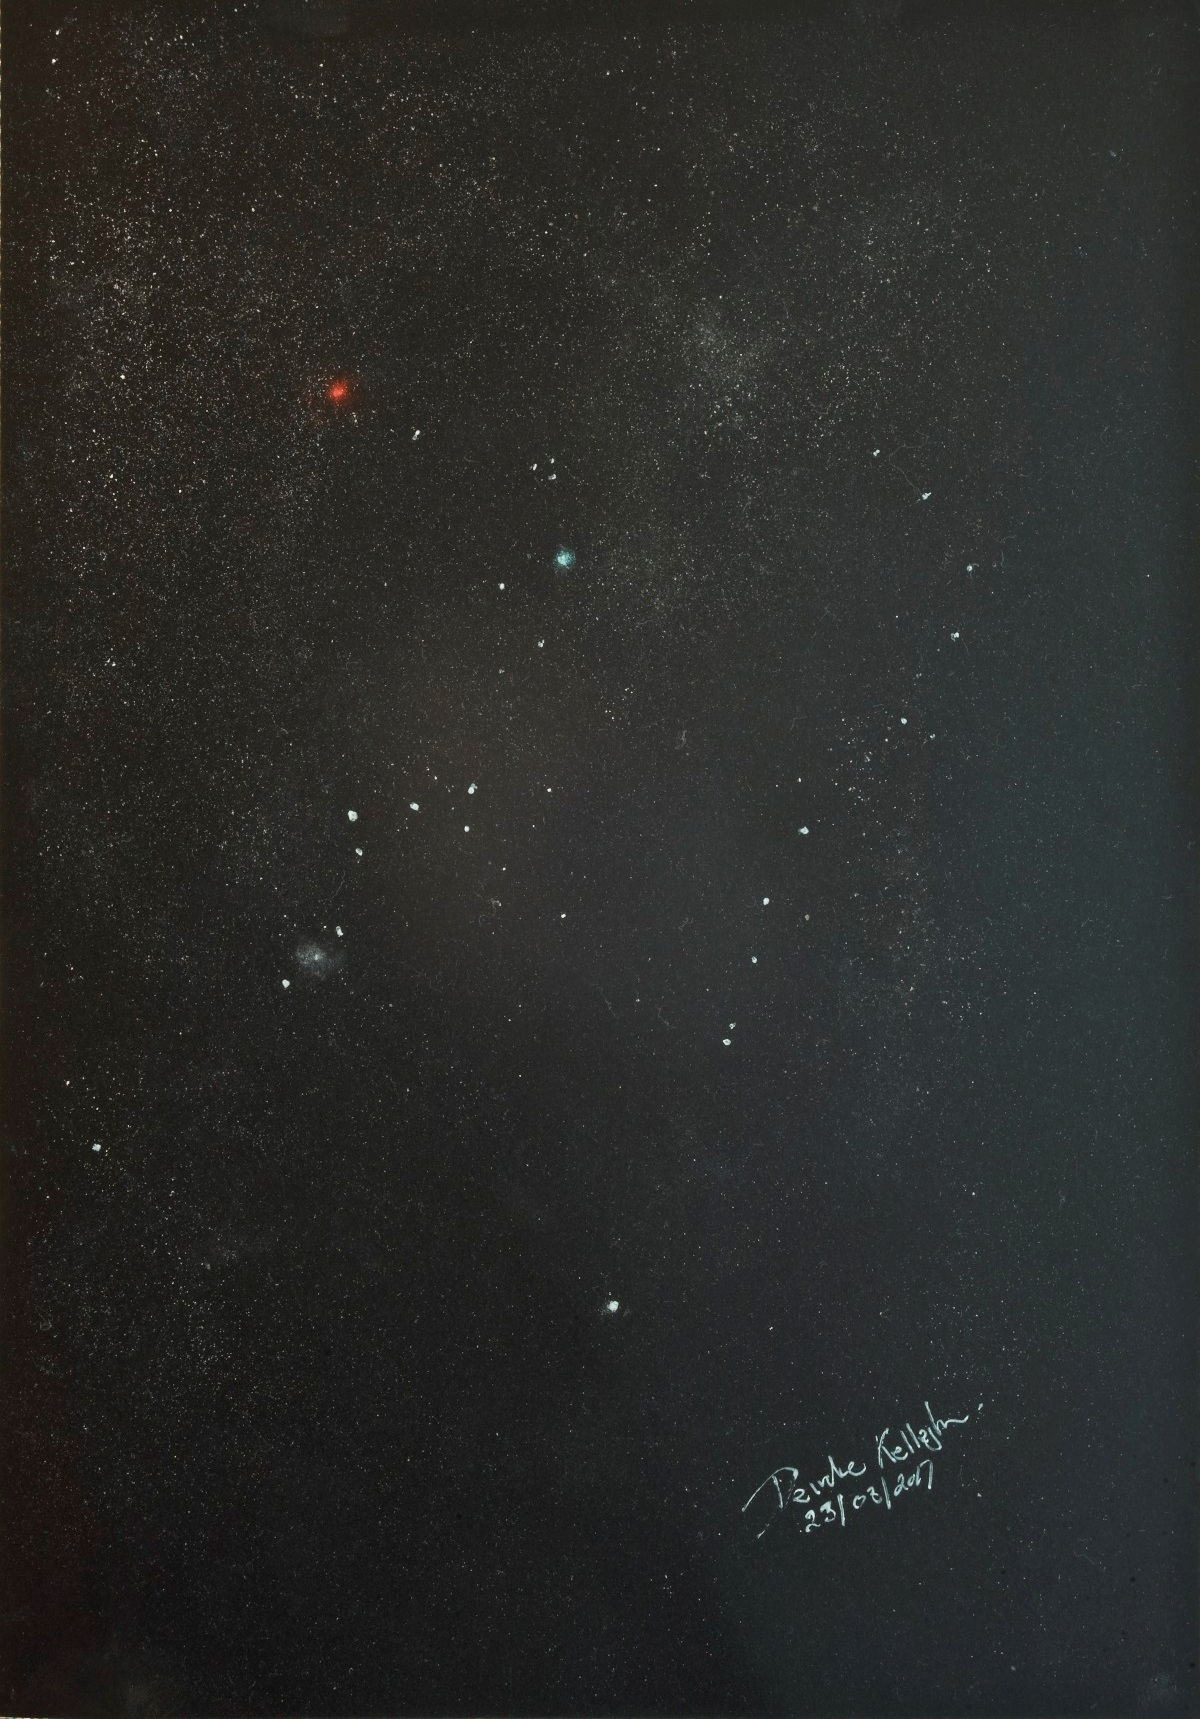 Orion a naked eye sketch - by Deirdre Kelleghan